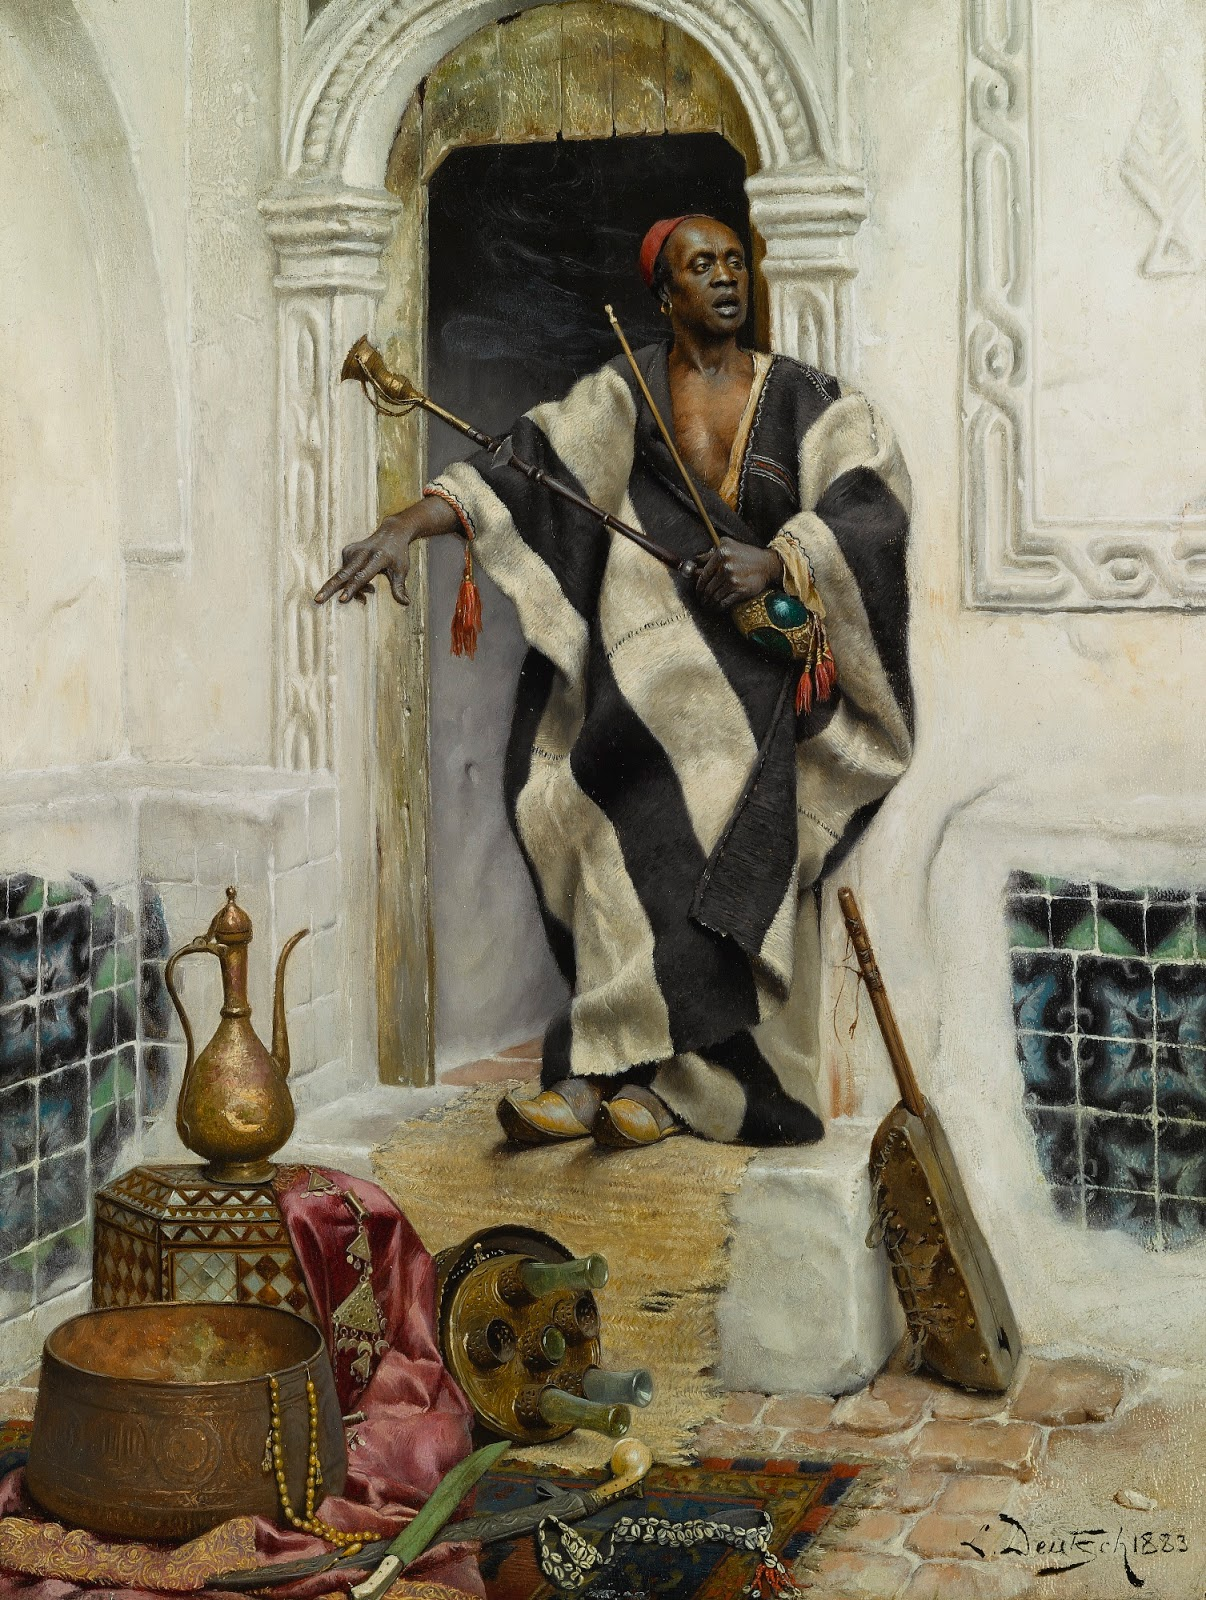 Sotheby's European Art Auction Highlights